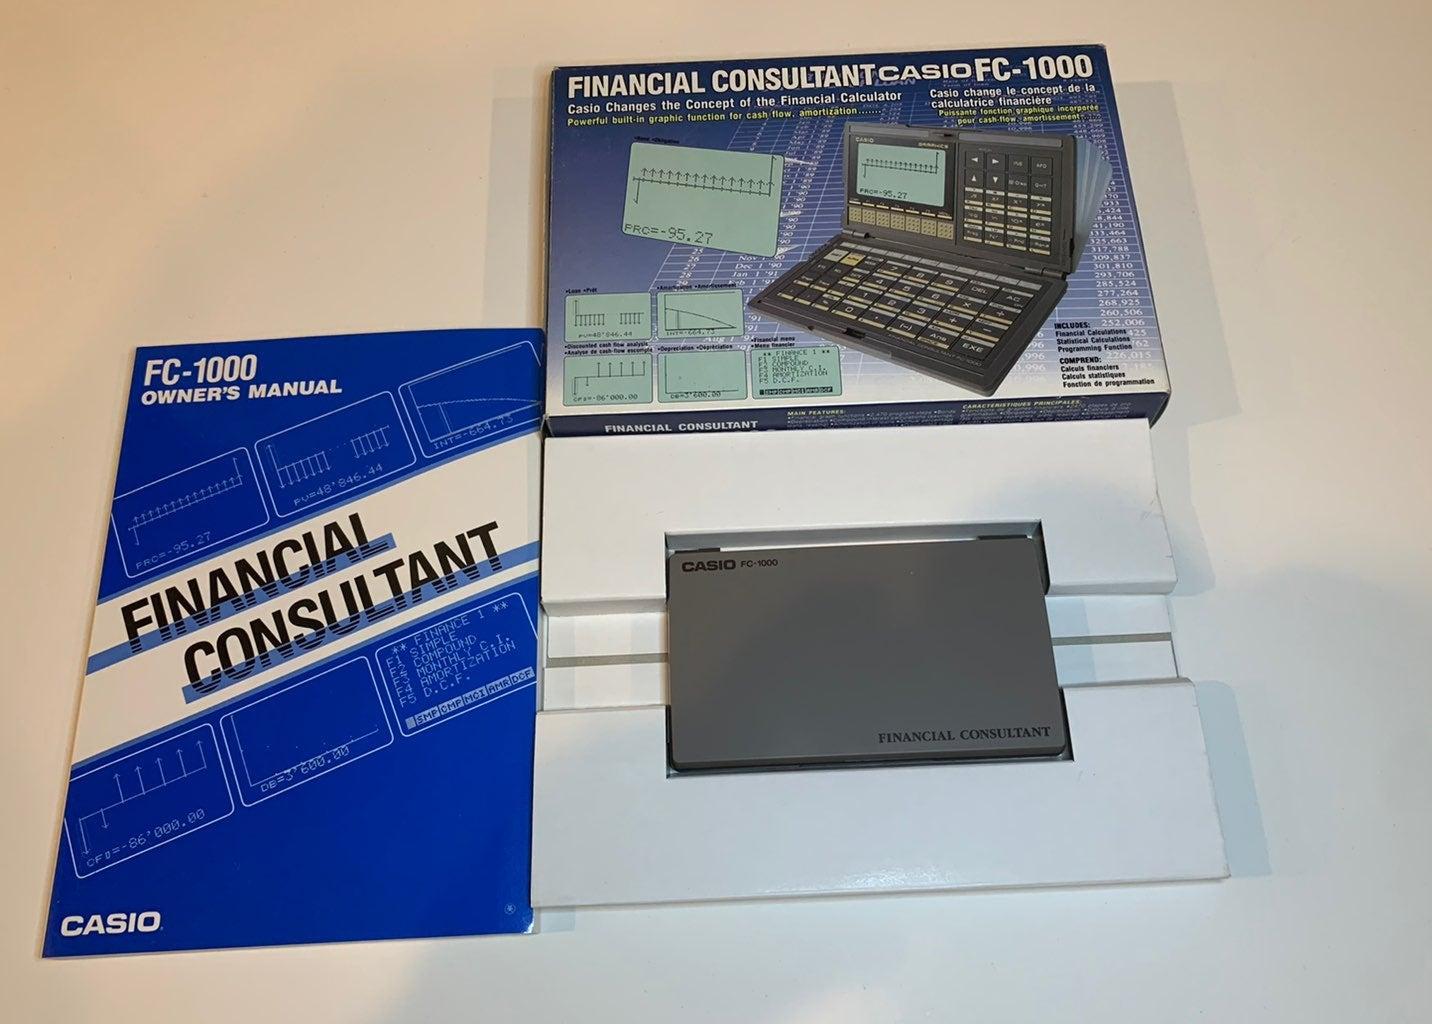 Casio FC-1000 Finacial Consultant Calcul